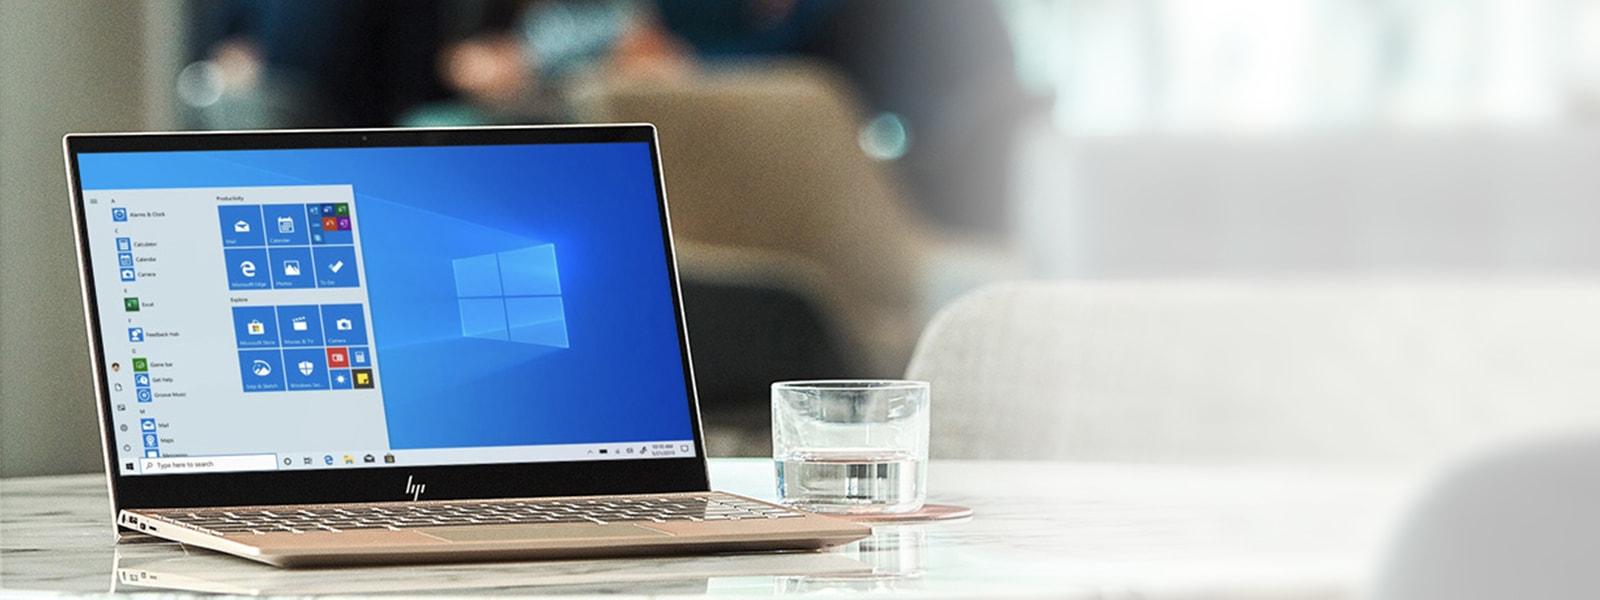 Laptop koji stoji na stolu